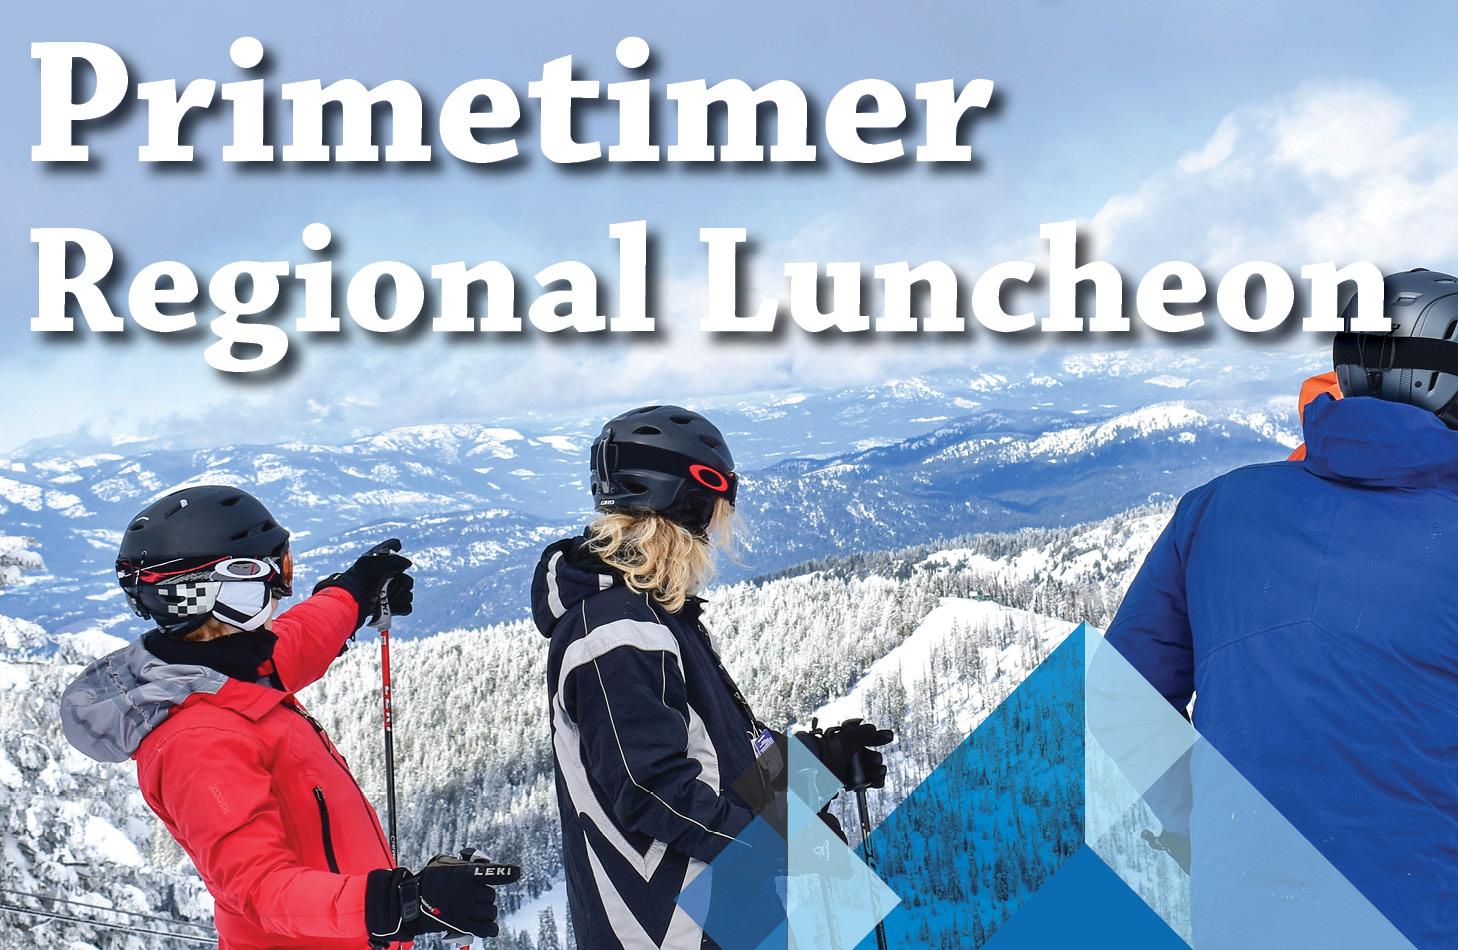 Primetimer Regional Luncheon